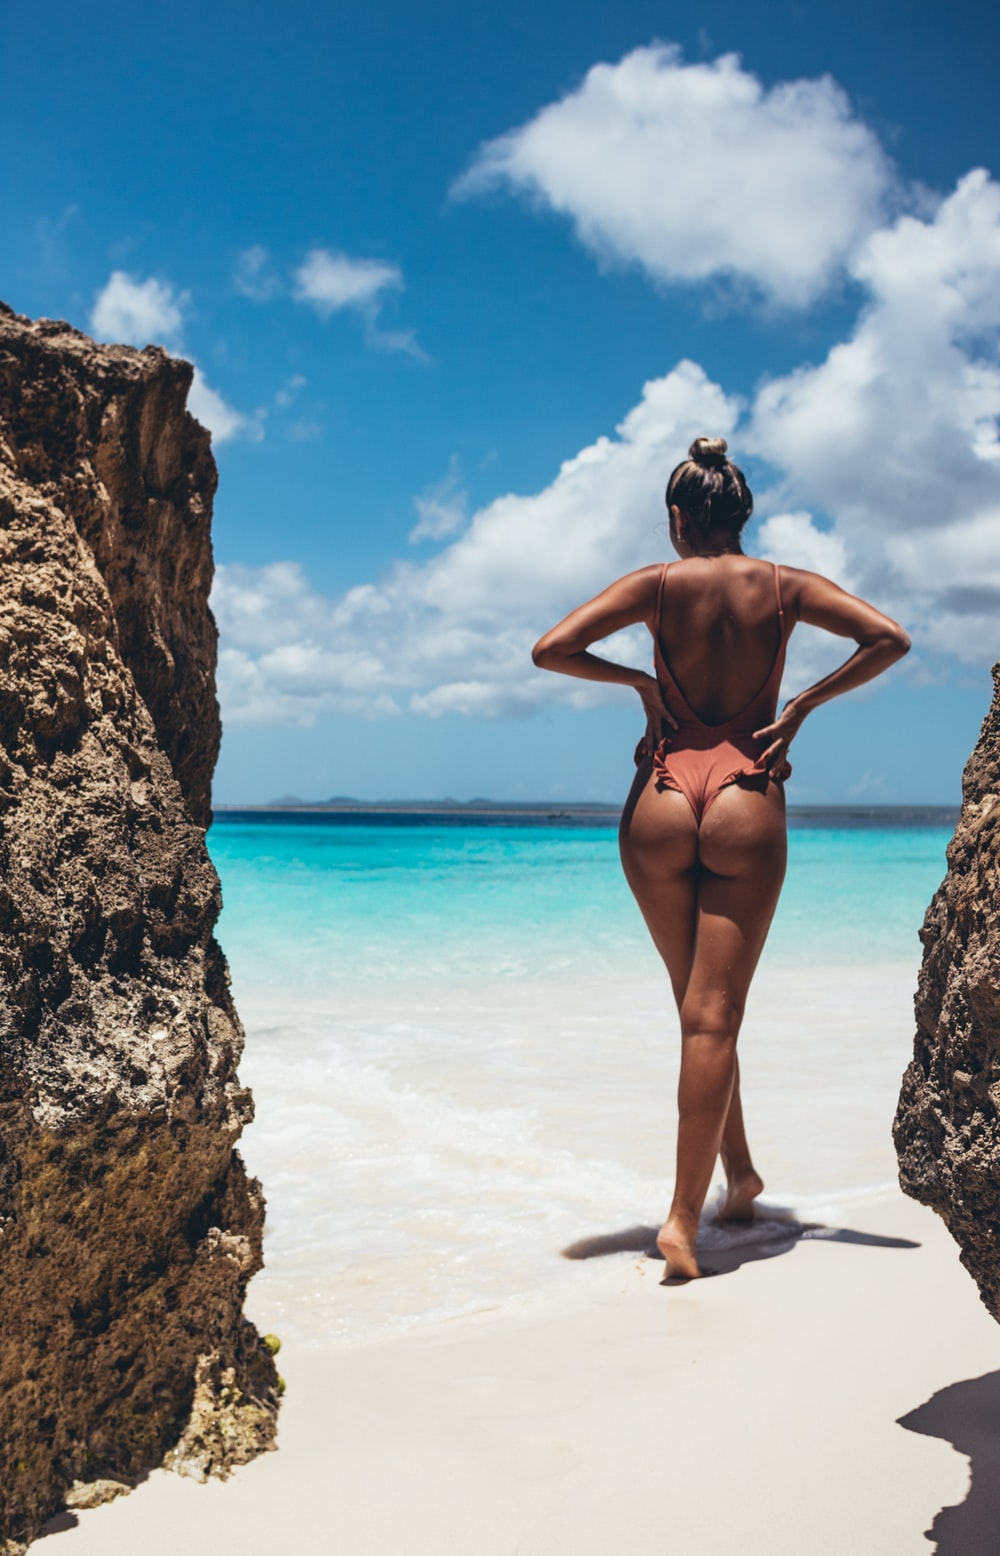 woman in black bikini standing on beach during daytime